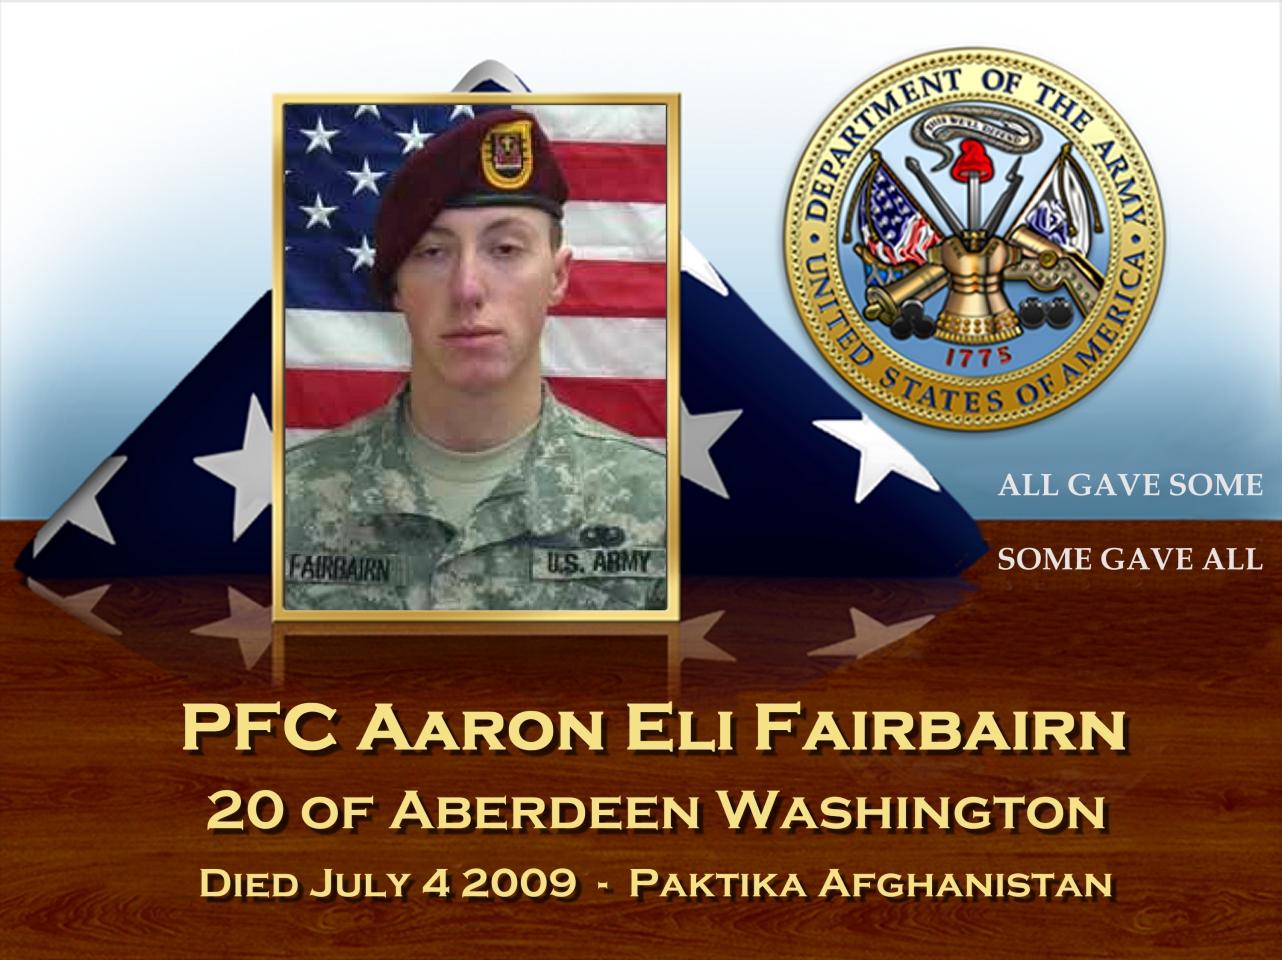 PFC Aaron Eli Fairbairn 20 Aberdeen Washington Died July 4 2009 Paktika Afghanistan